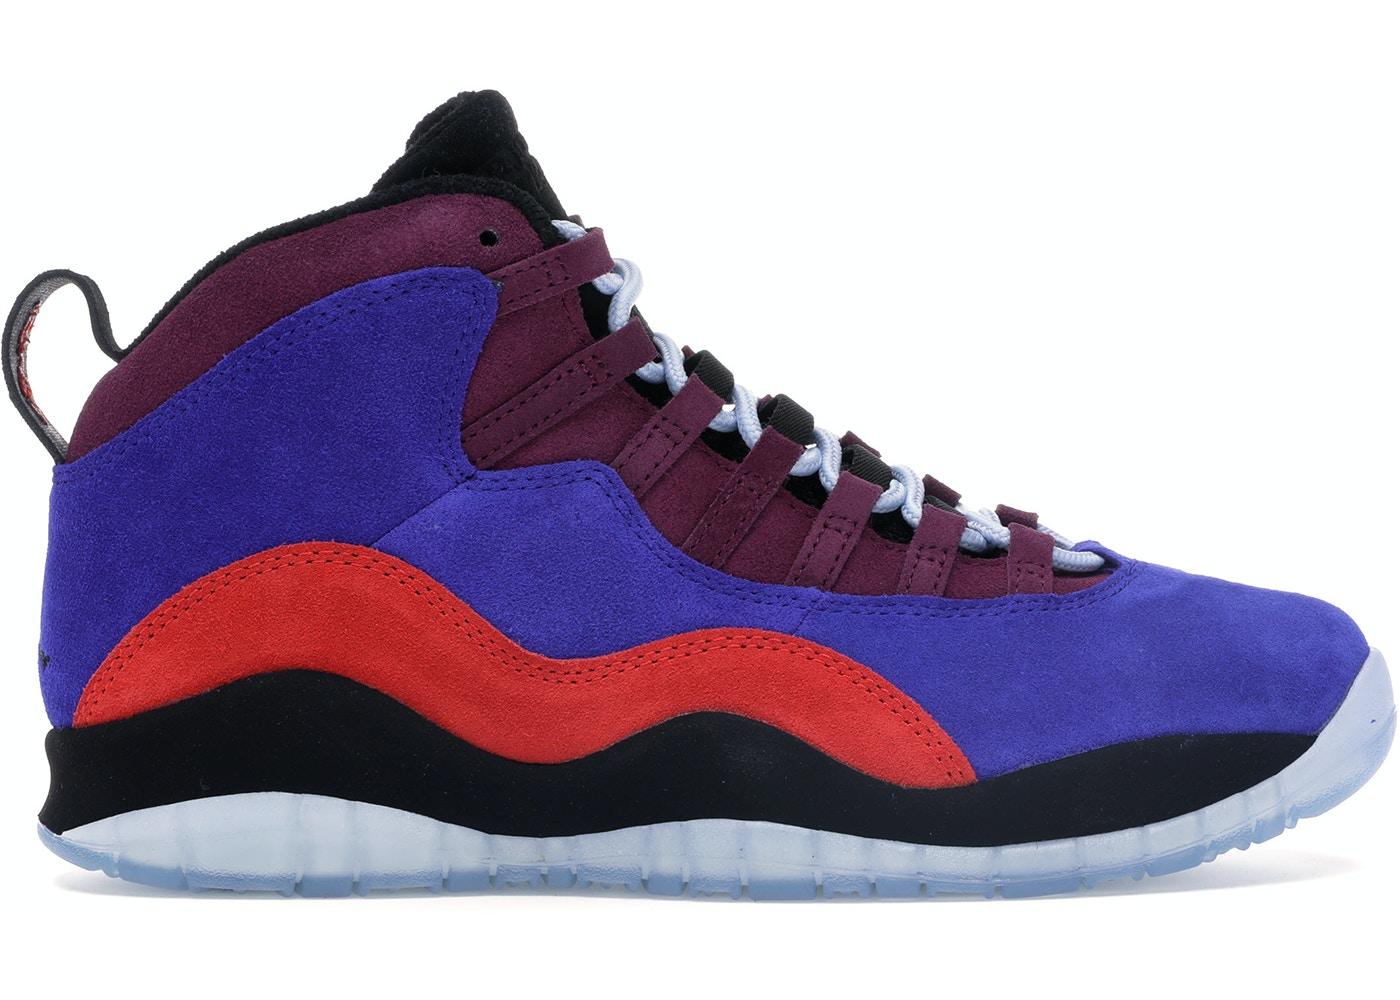 new style cc847 50872 Buy Air Jordan 10 Shoes   Deadstock Sneakers